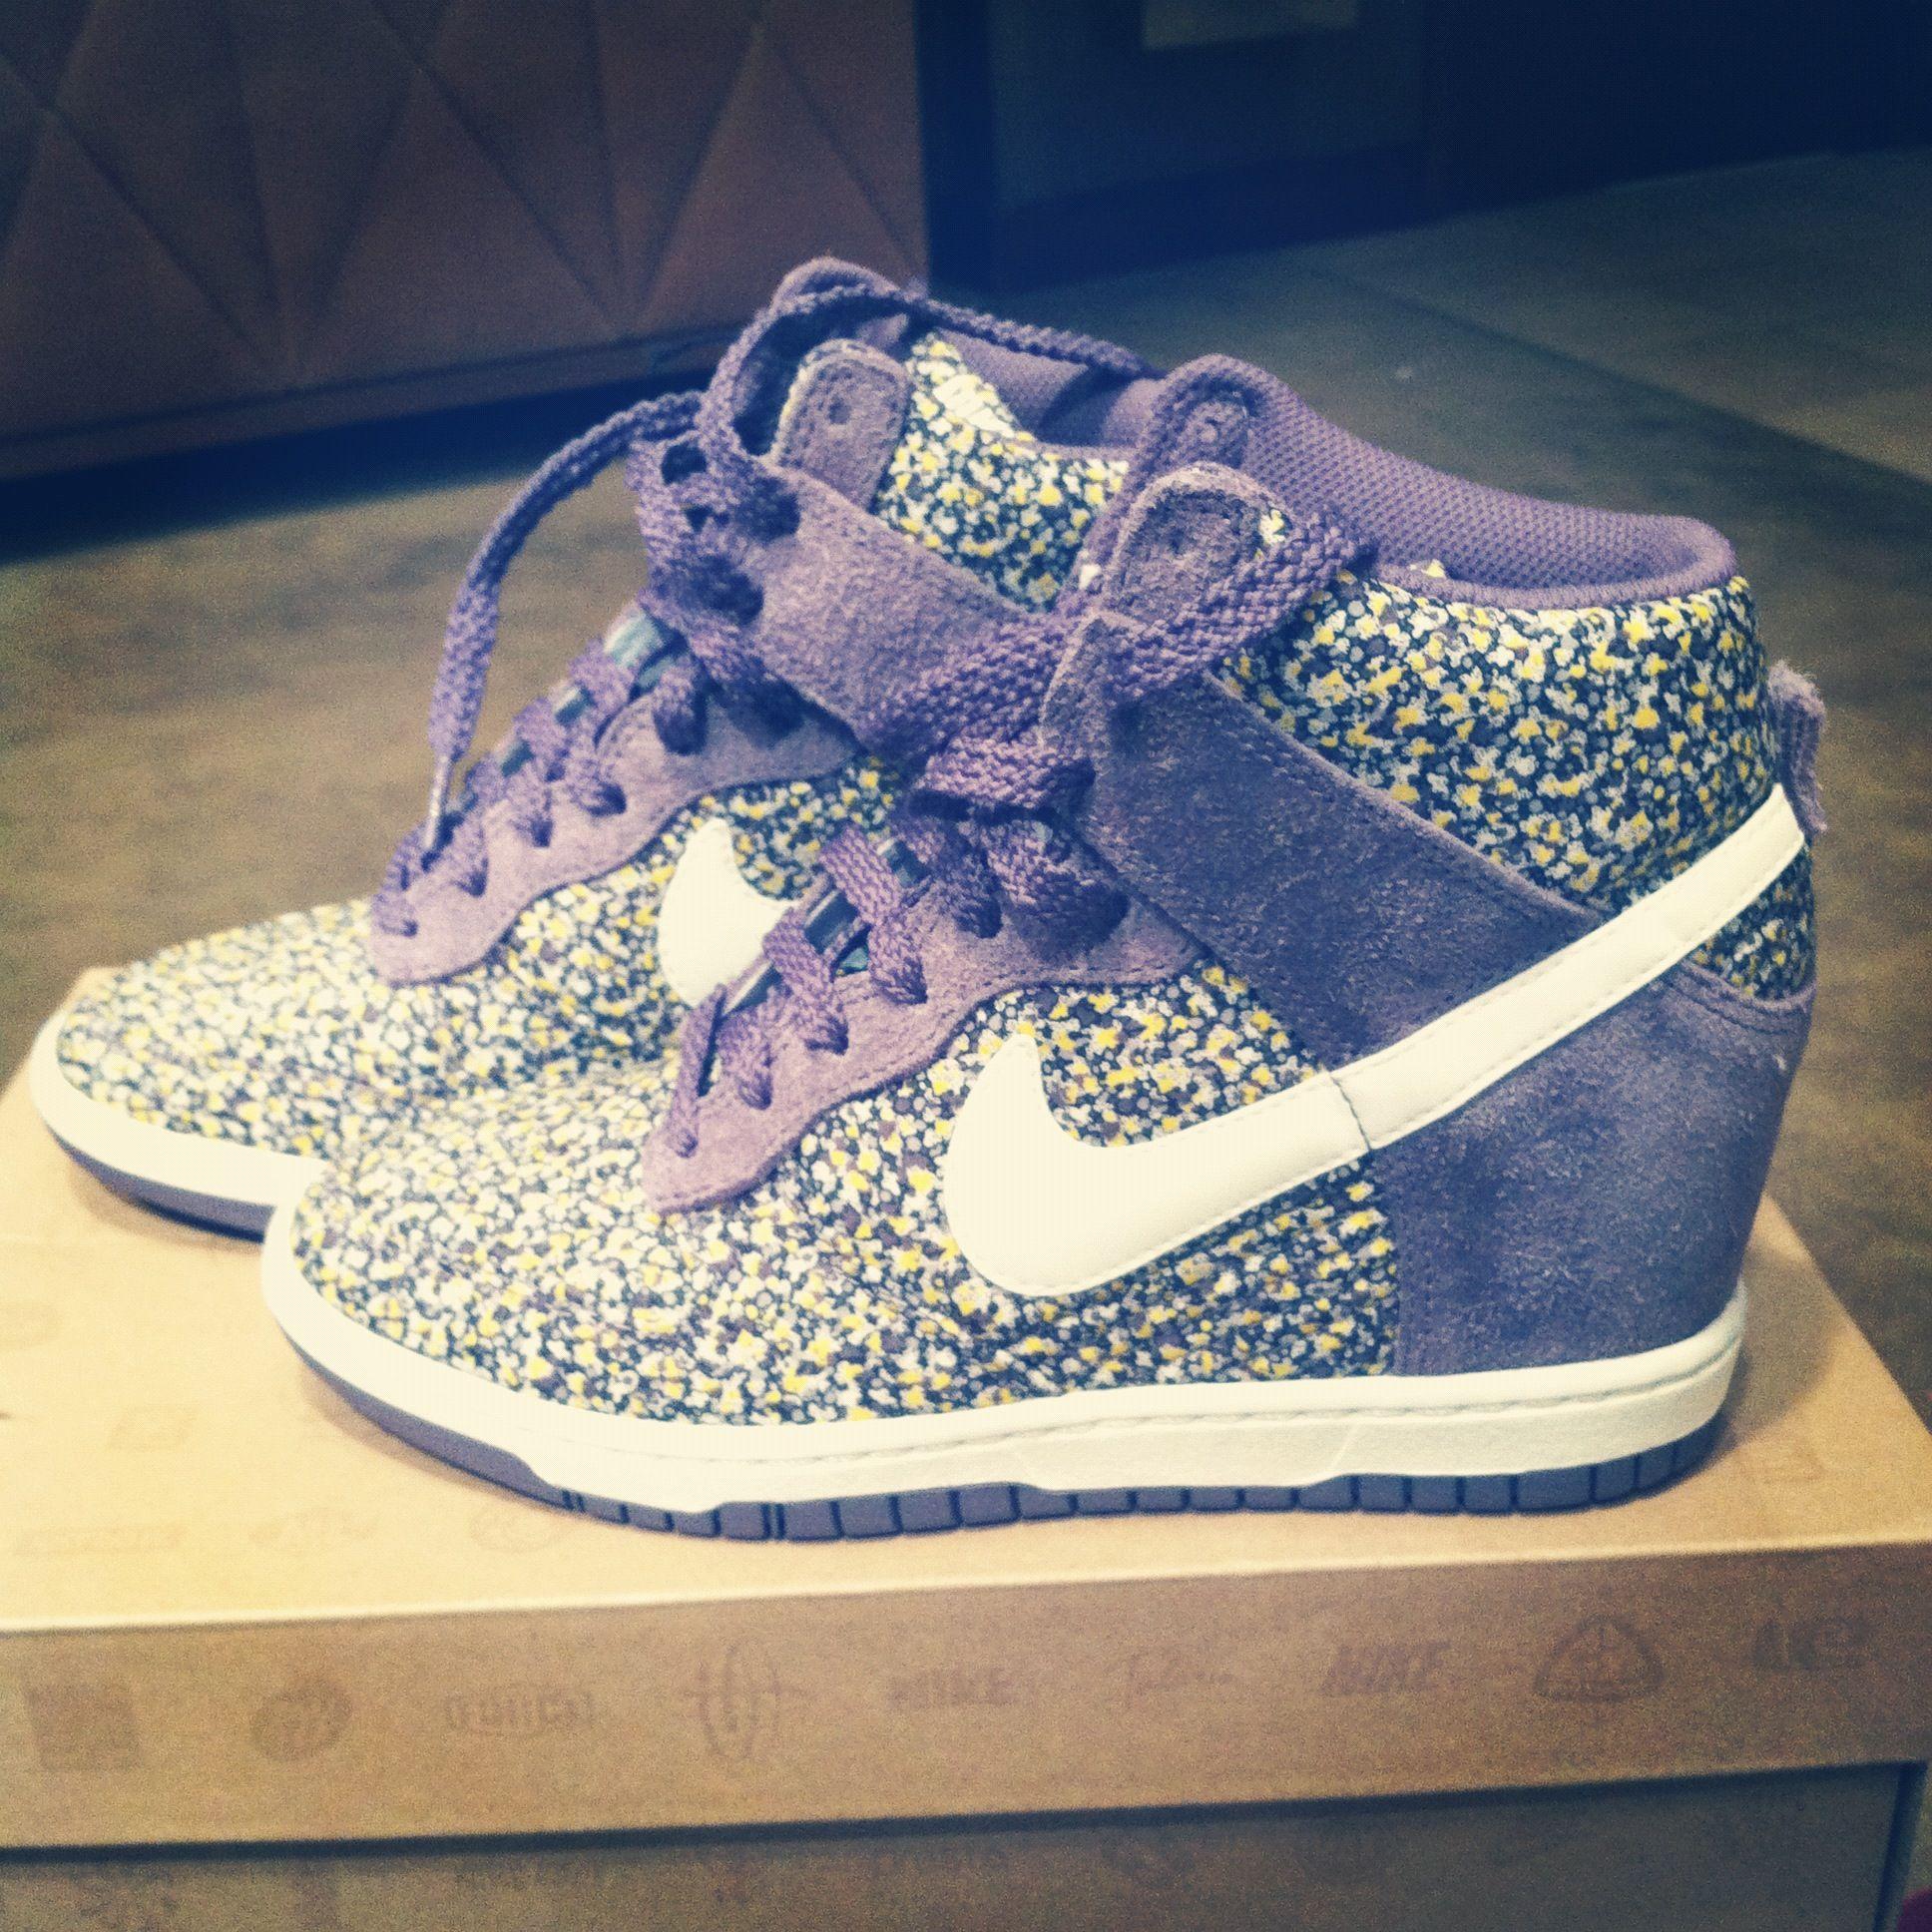 Nike Shoes Teenage Girls Sneakers Girls Sneakers Girls Shoes